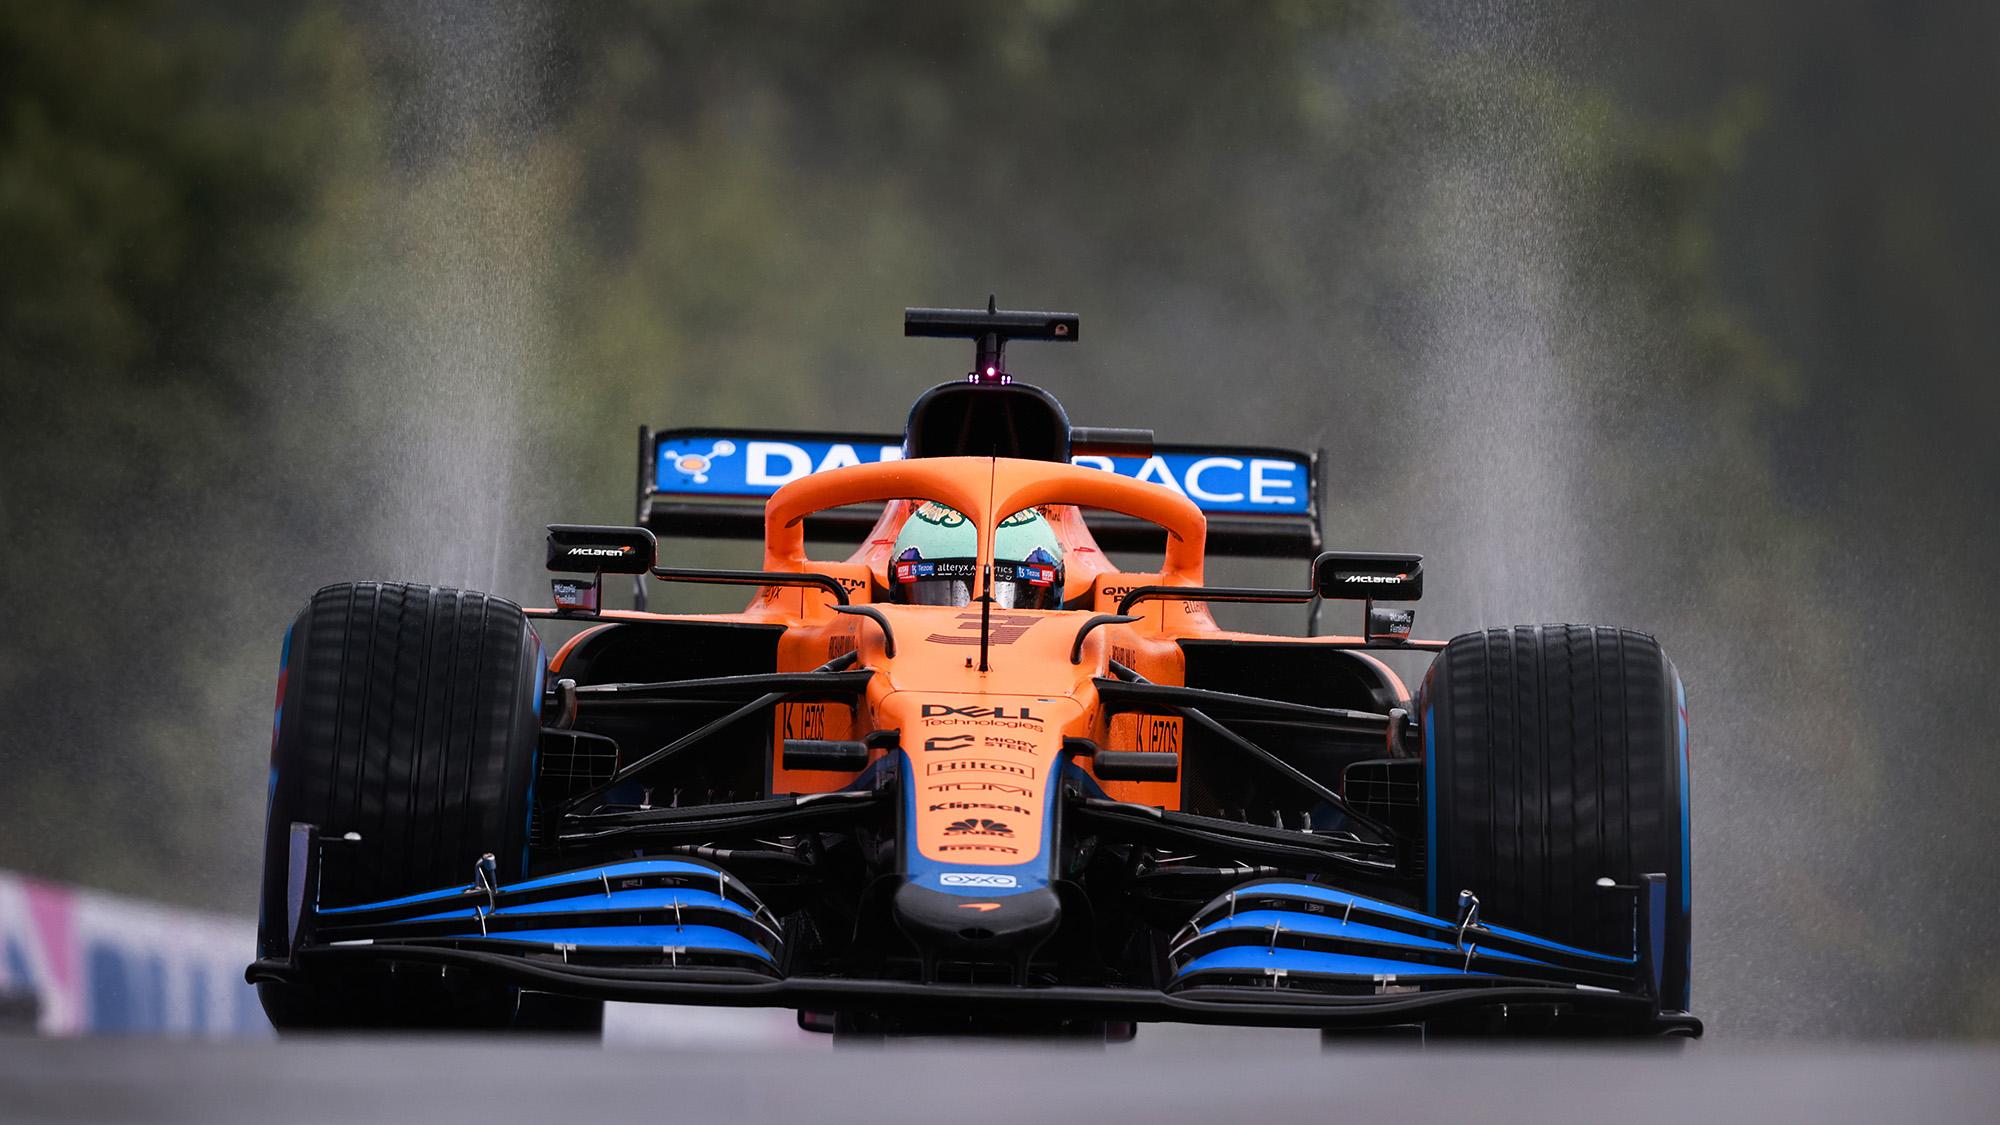 Daniel Ricciardo in qualifying for the 2021 Belgian Grand Prix